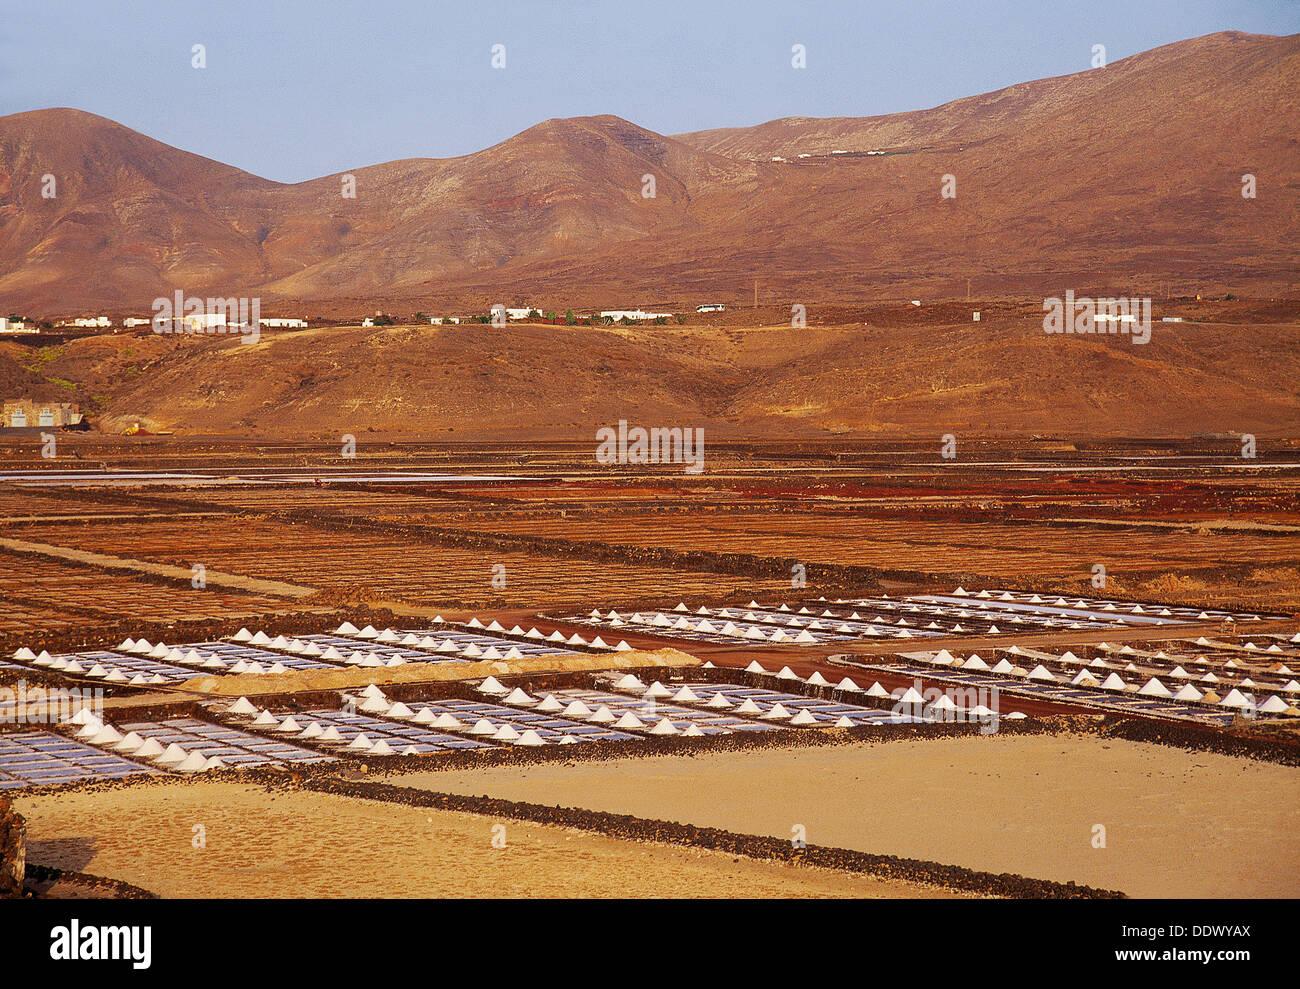 Janubio Saltworks. Lanzarote island, Canary Islands, Spain. Stock Photo